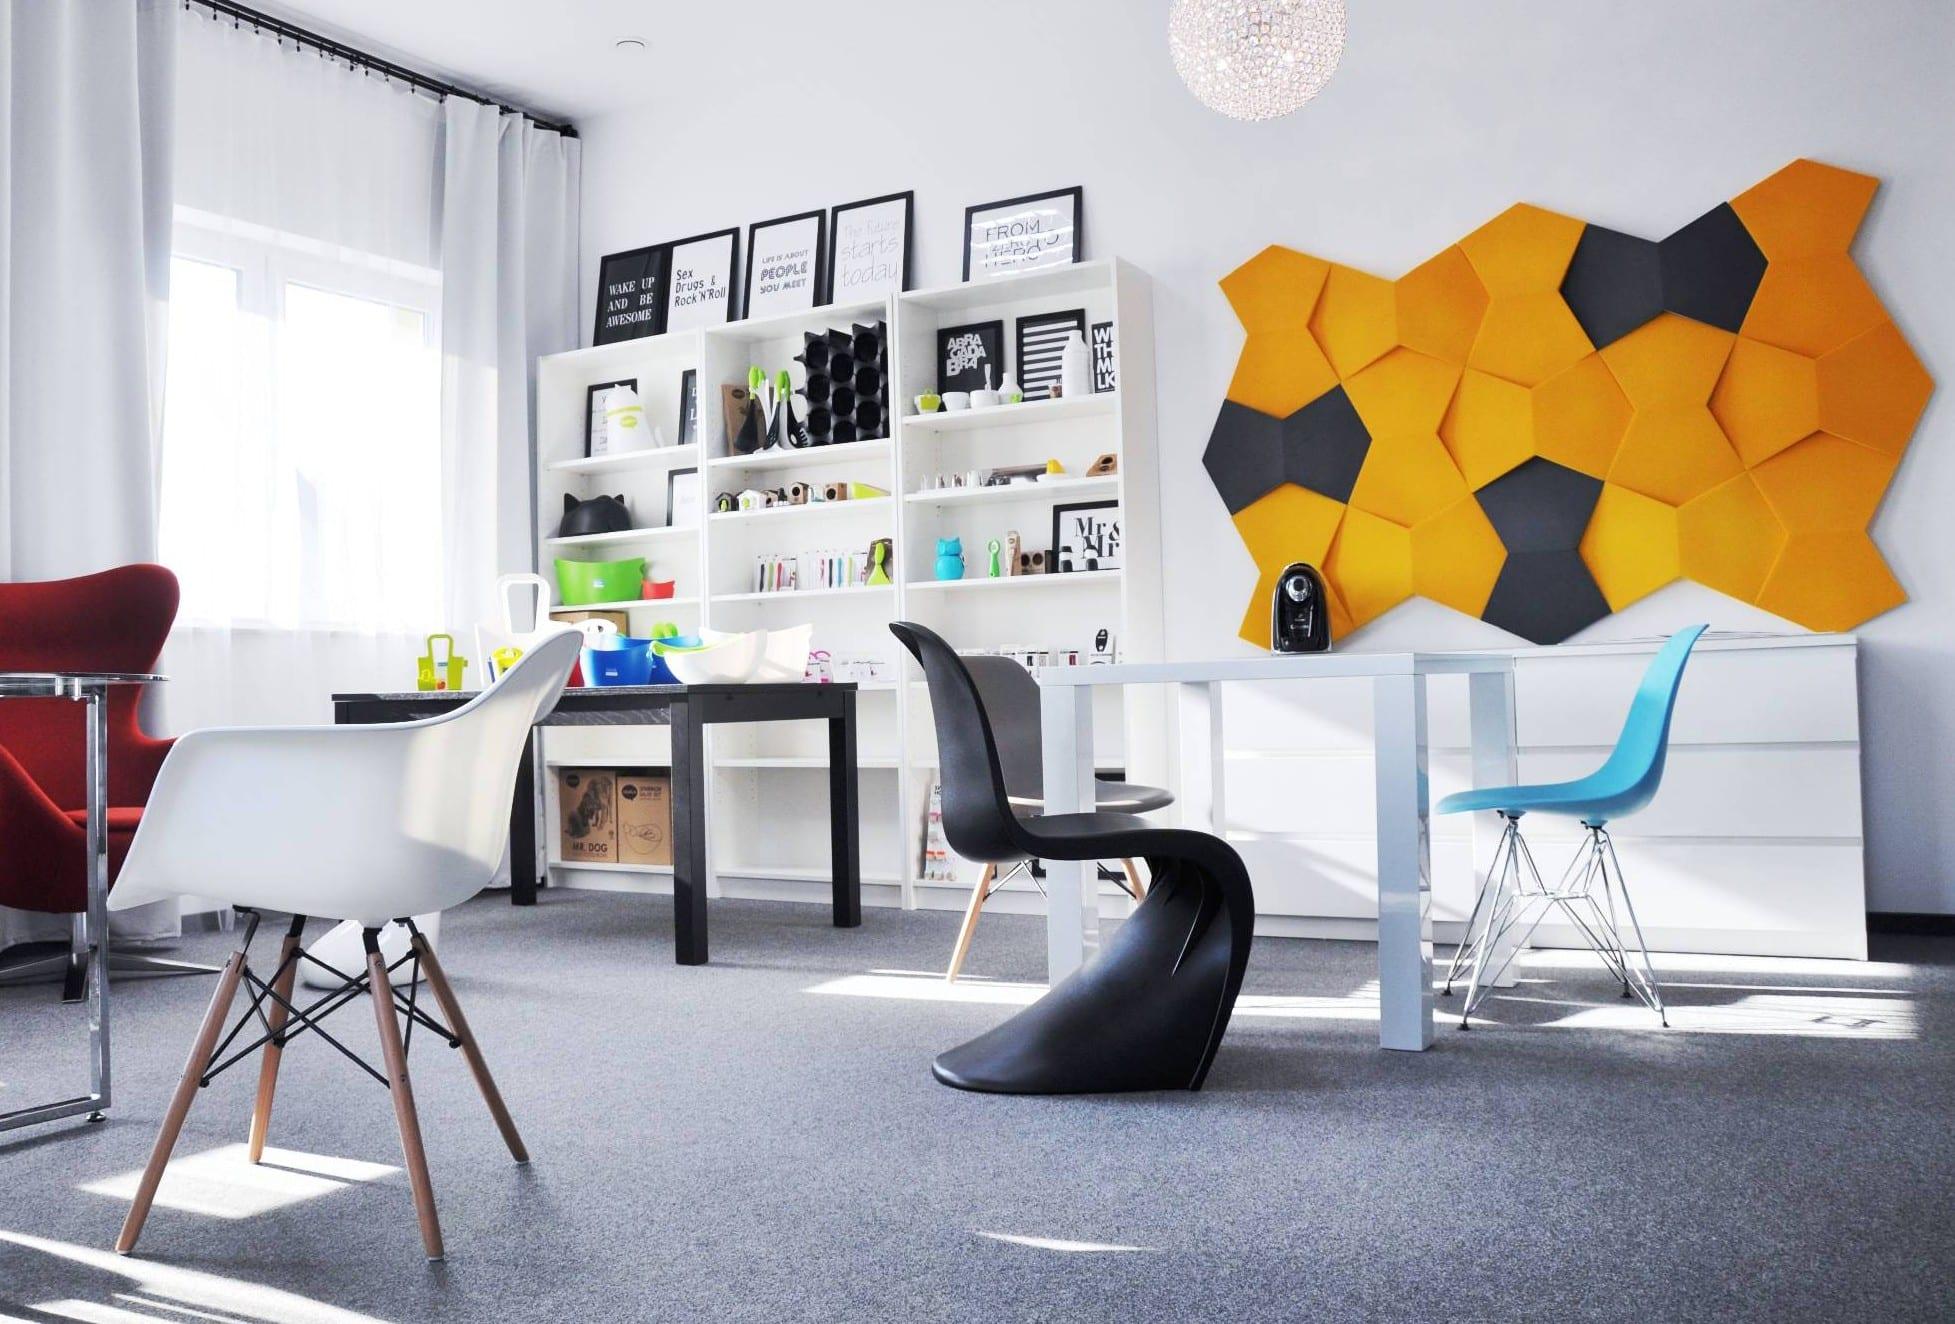 Wandgestaltung 3d Kreative Wohnideen Fur Moderne Wandgestaltung Und